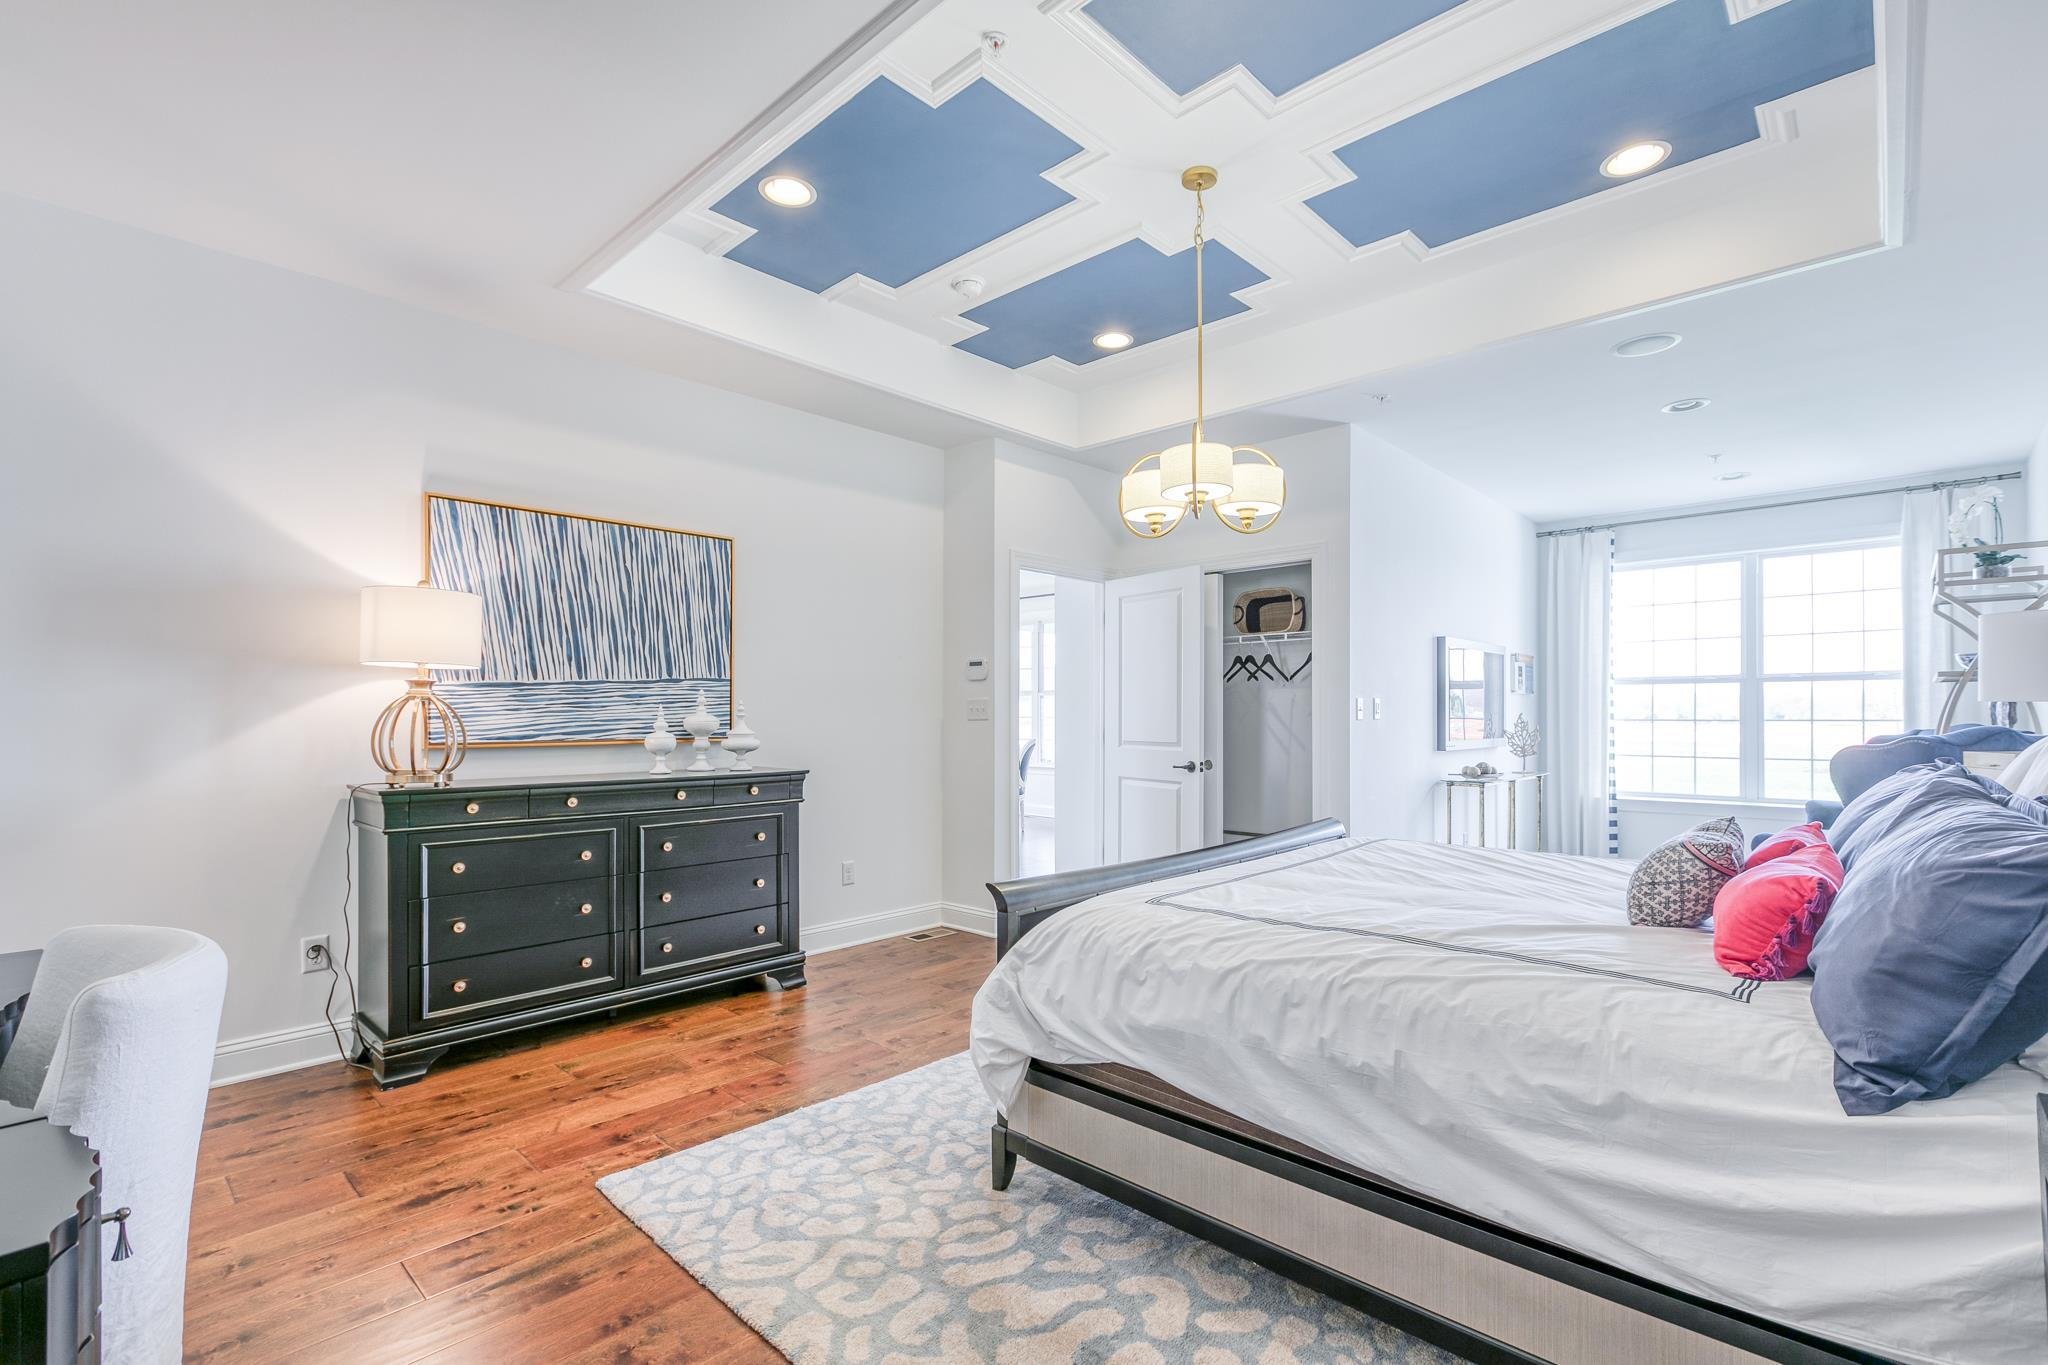 Bedroom featured in The Laurel By McKee Builders in Eastern Shore, MD